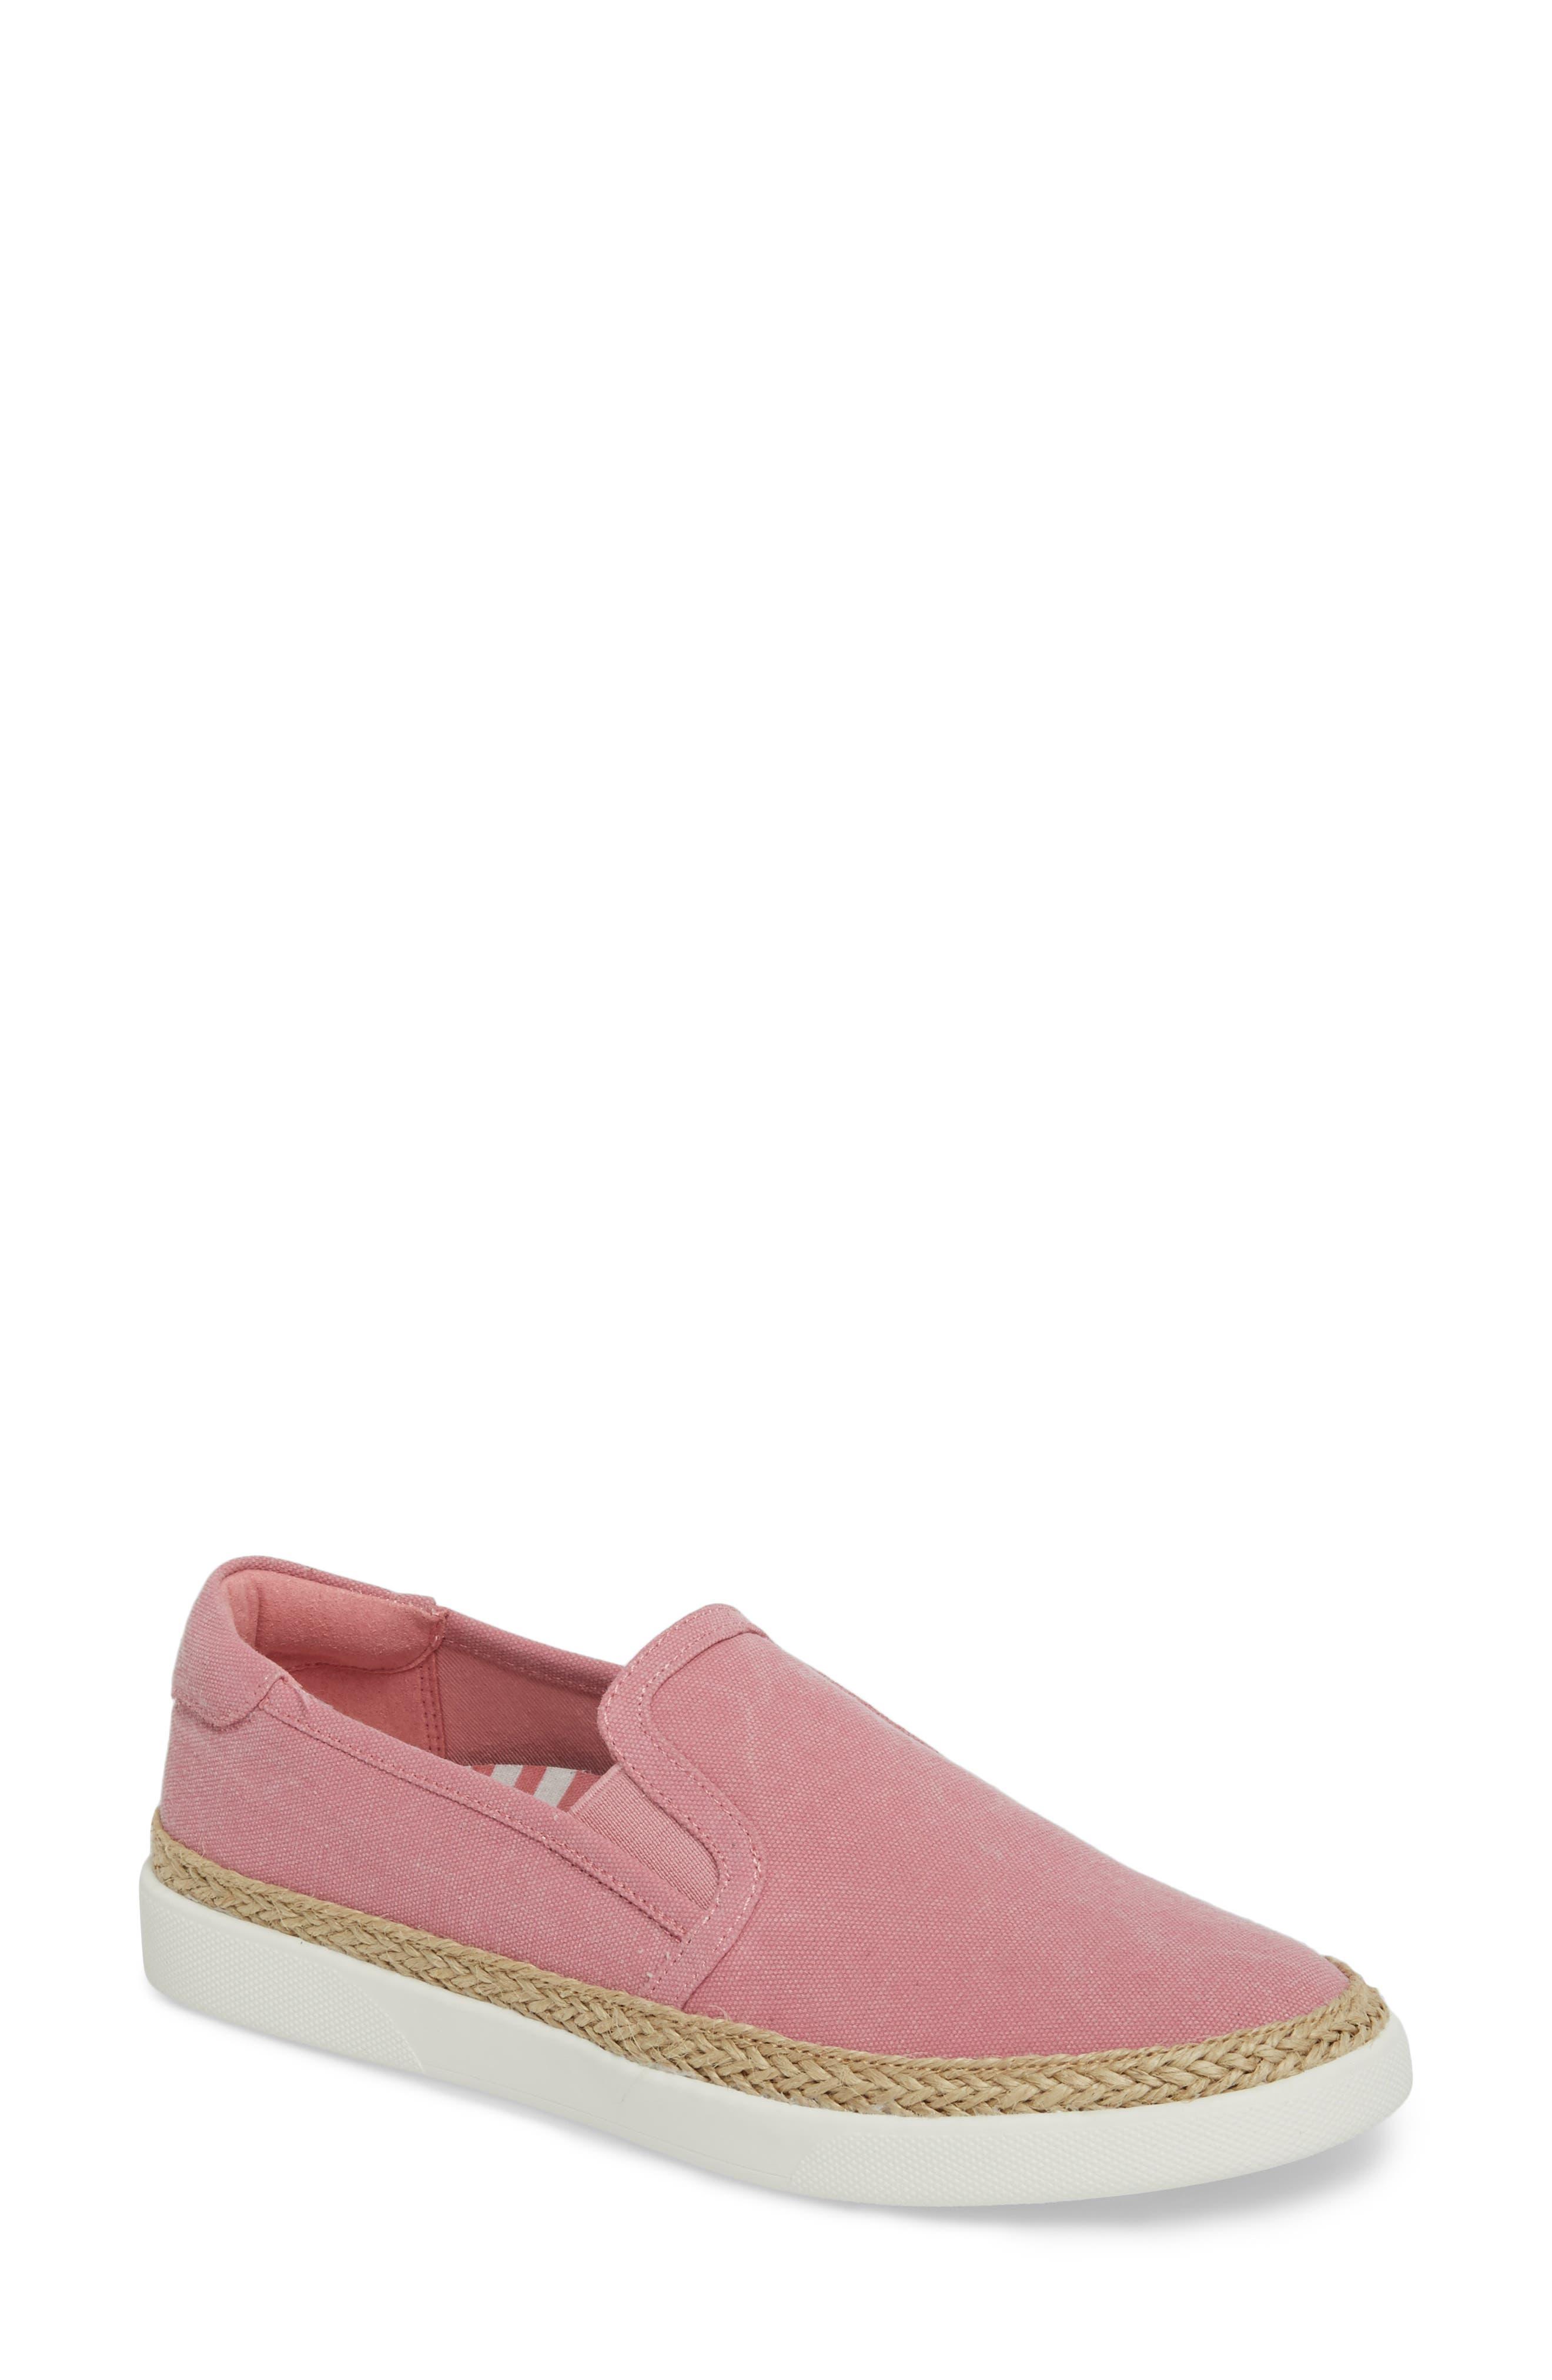 Rae Slip-On Sneaker,                             Main thumbnail 1, color,                             Light Pink Canvas